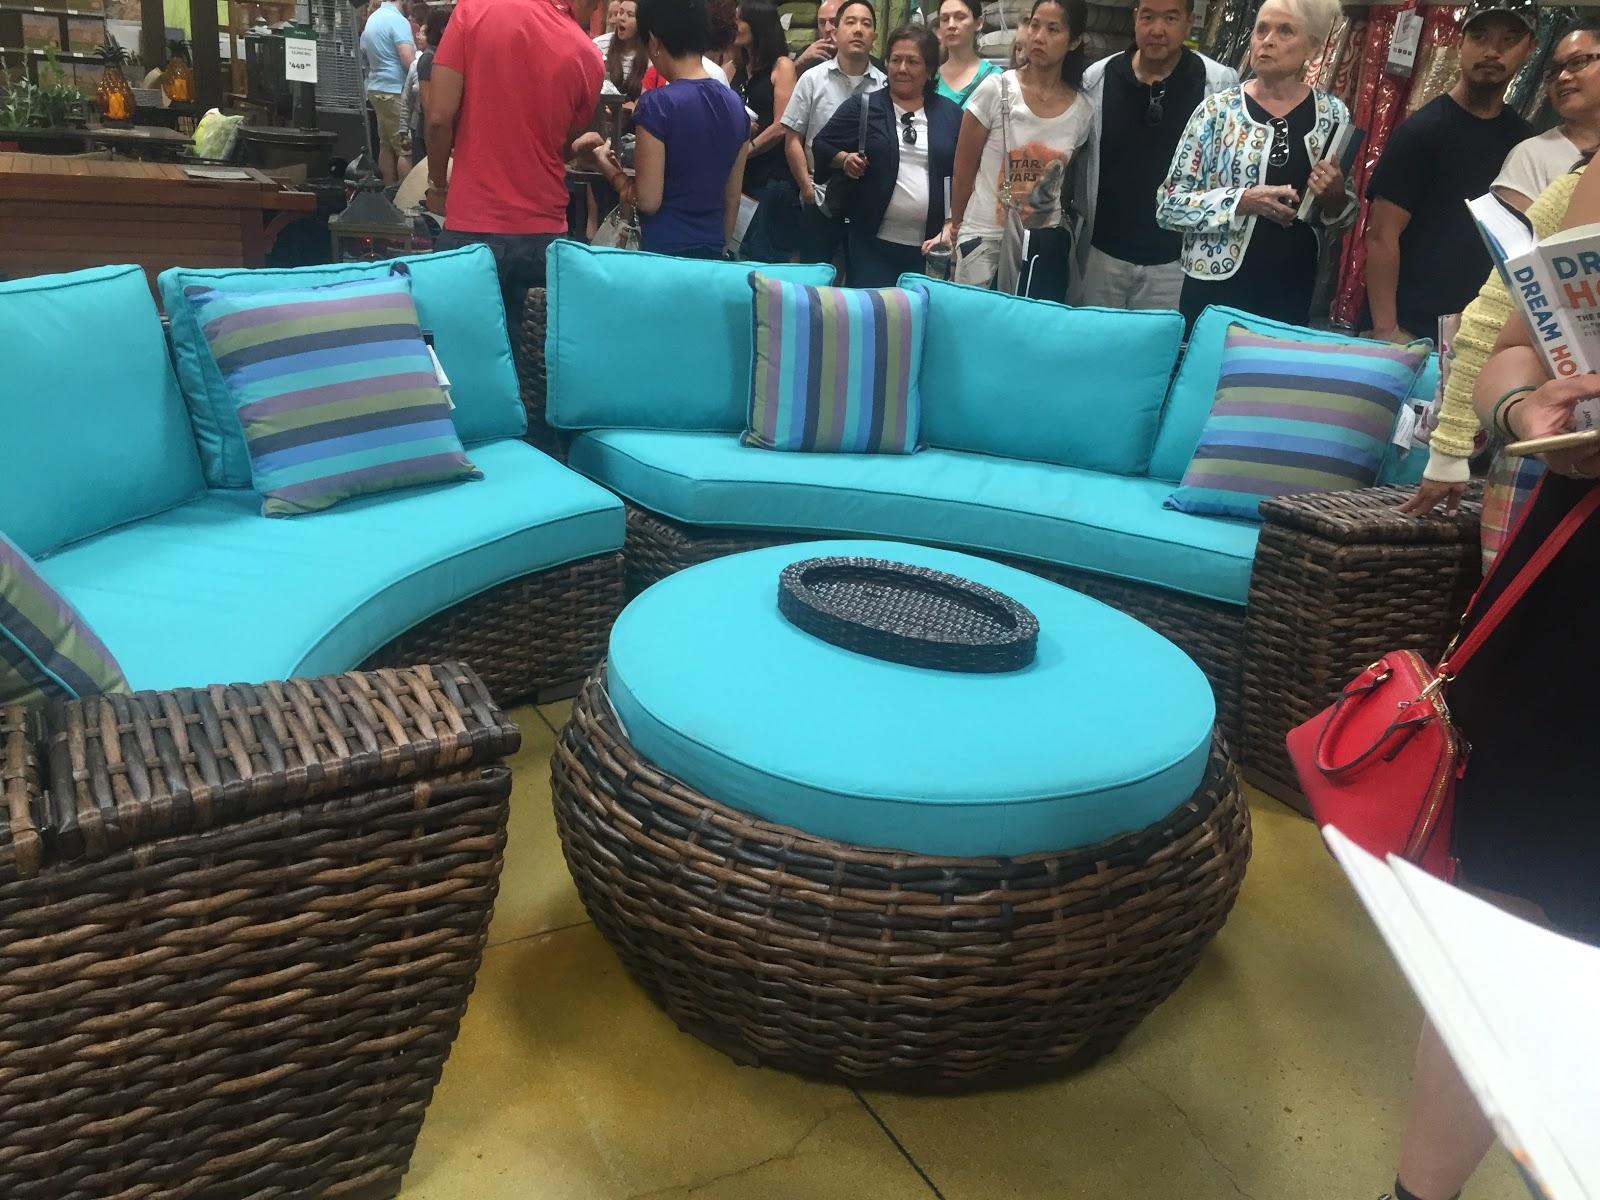 San Jose Food Blog The Property Brothers Debut Scott Living Furniture at Orc